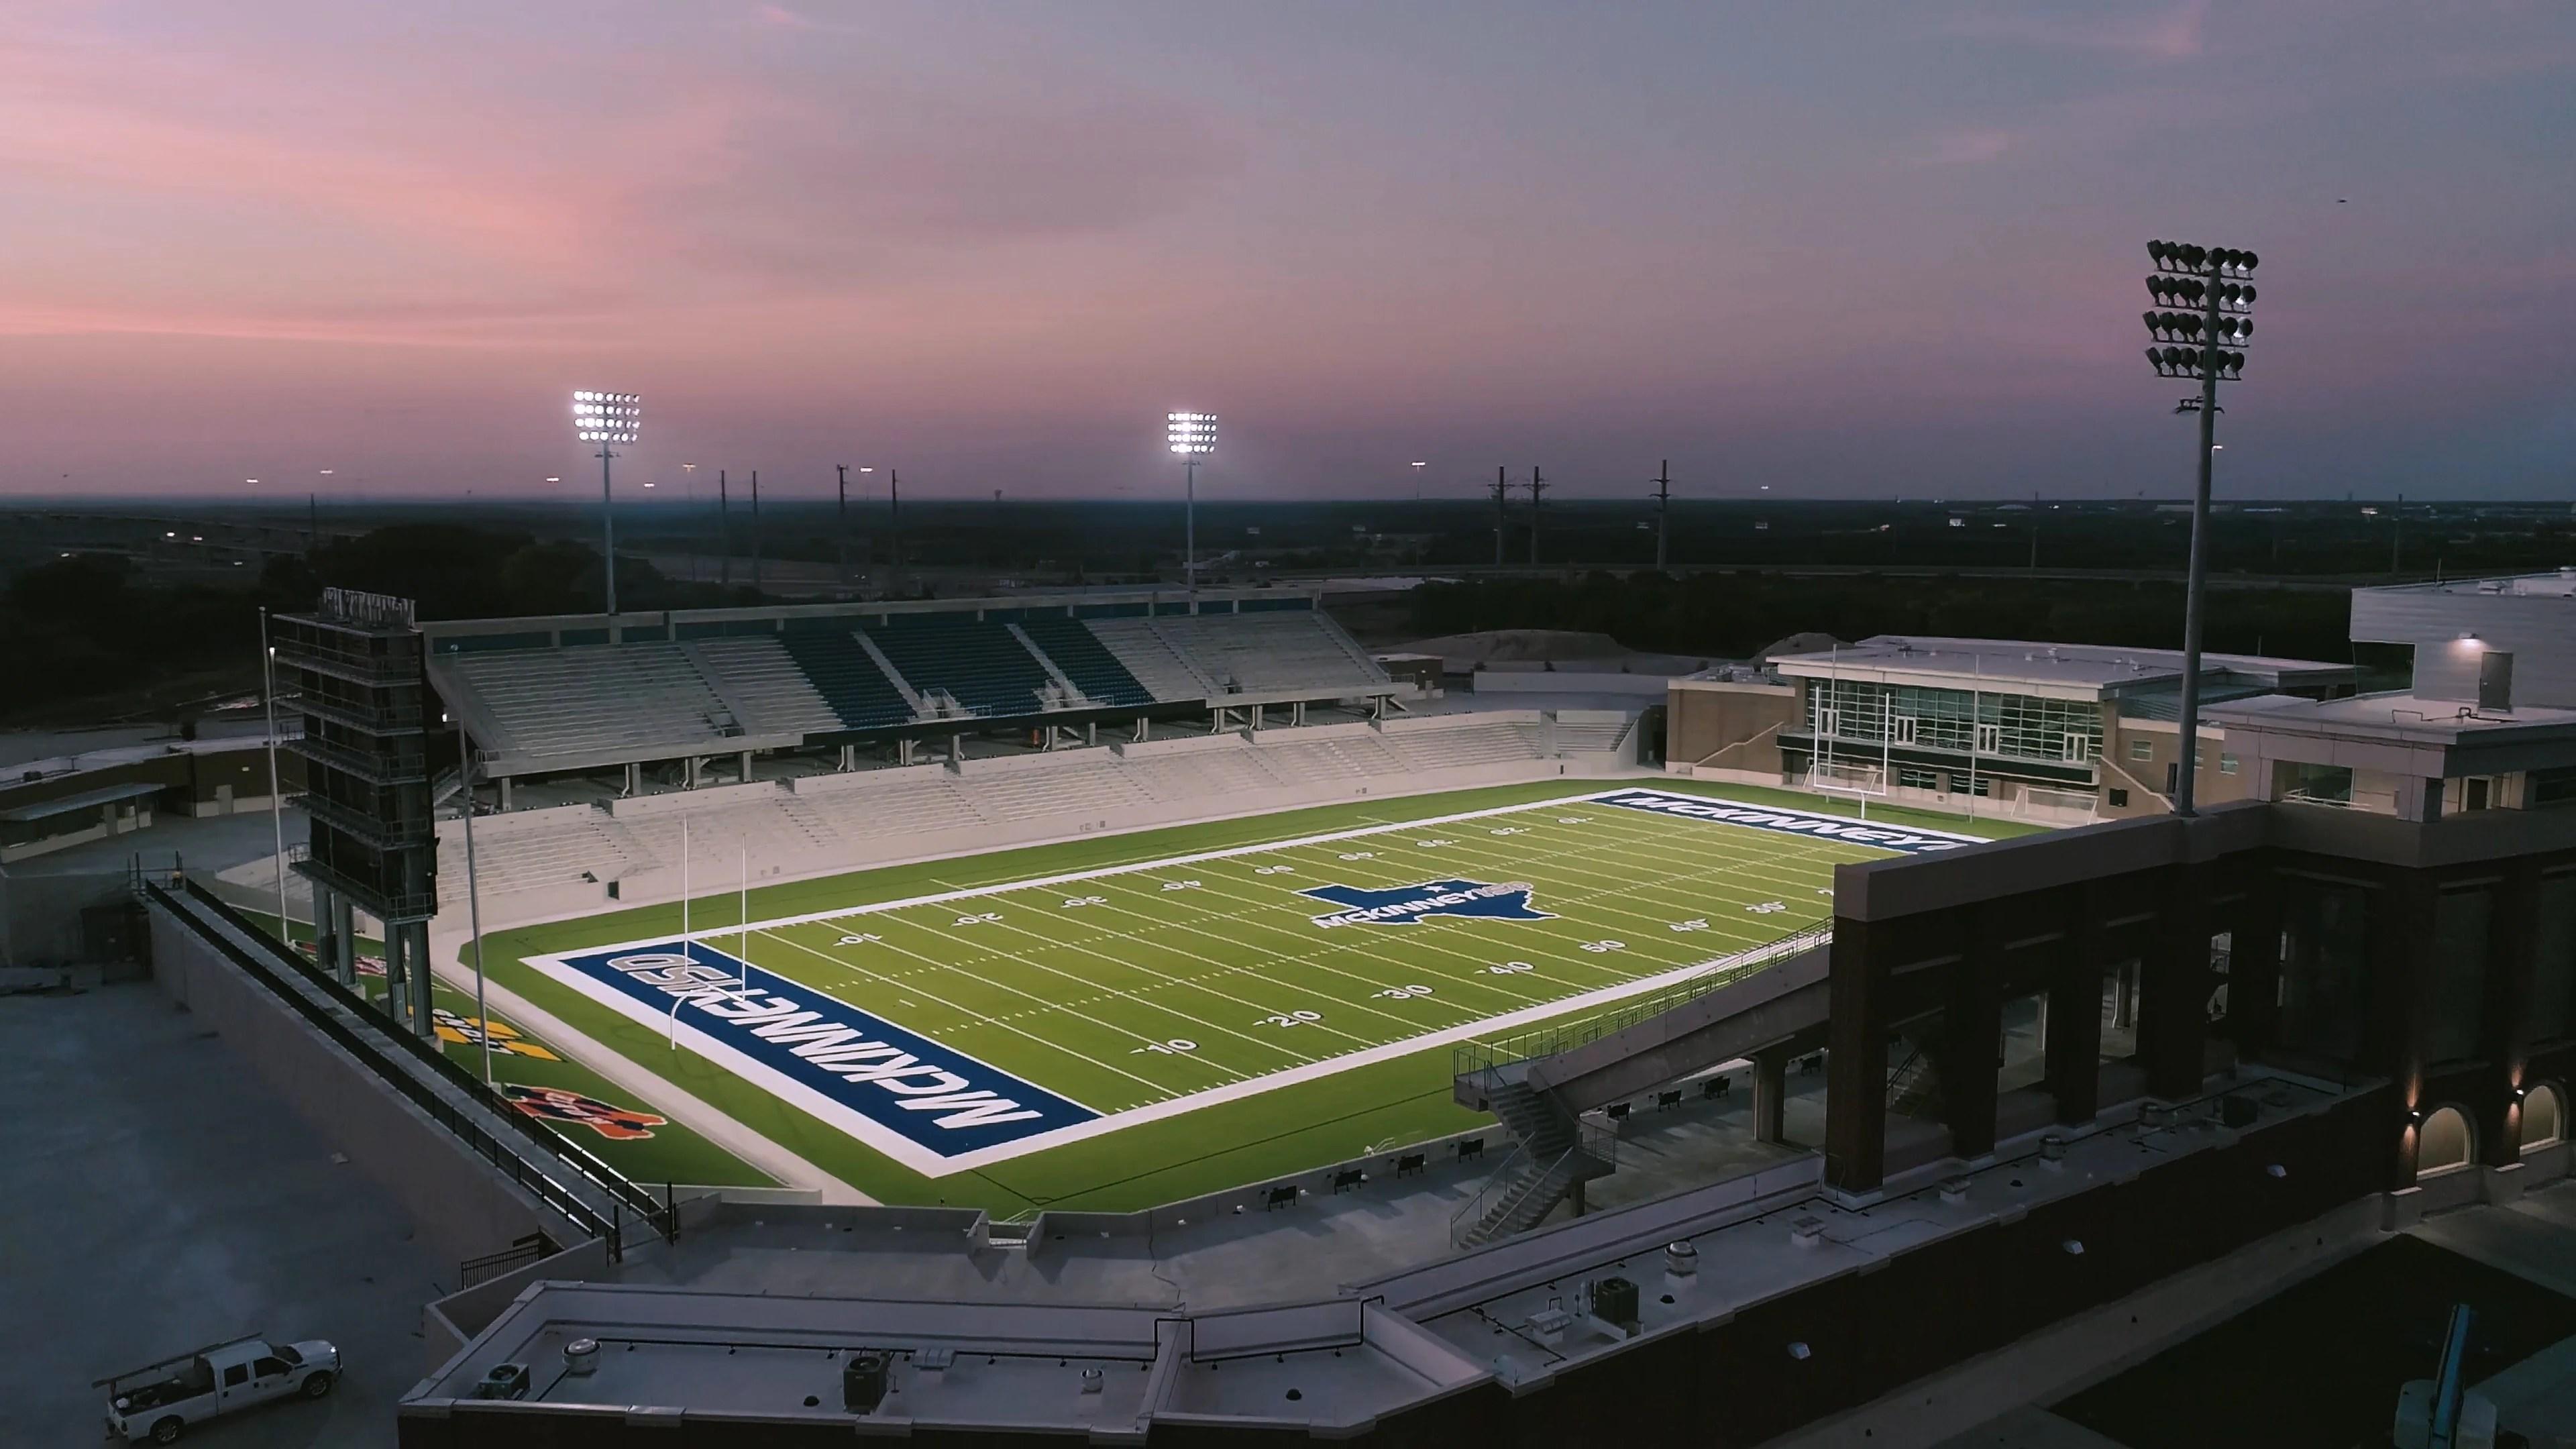 2018 DII Football Championship Headed To Texas